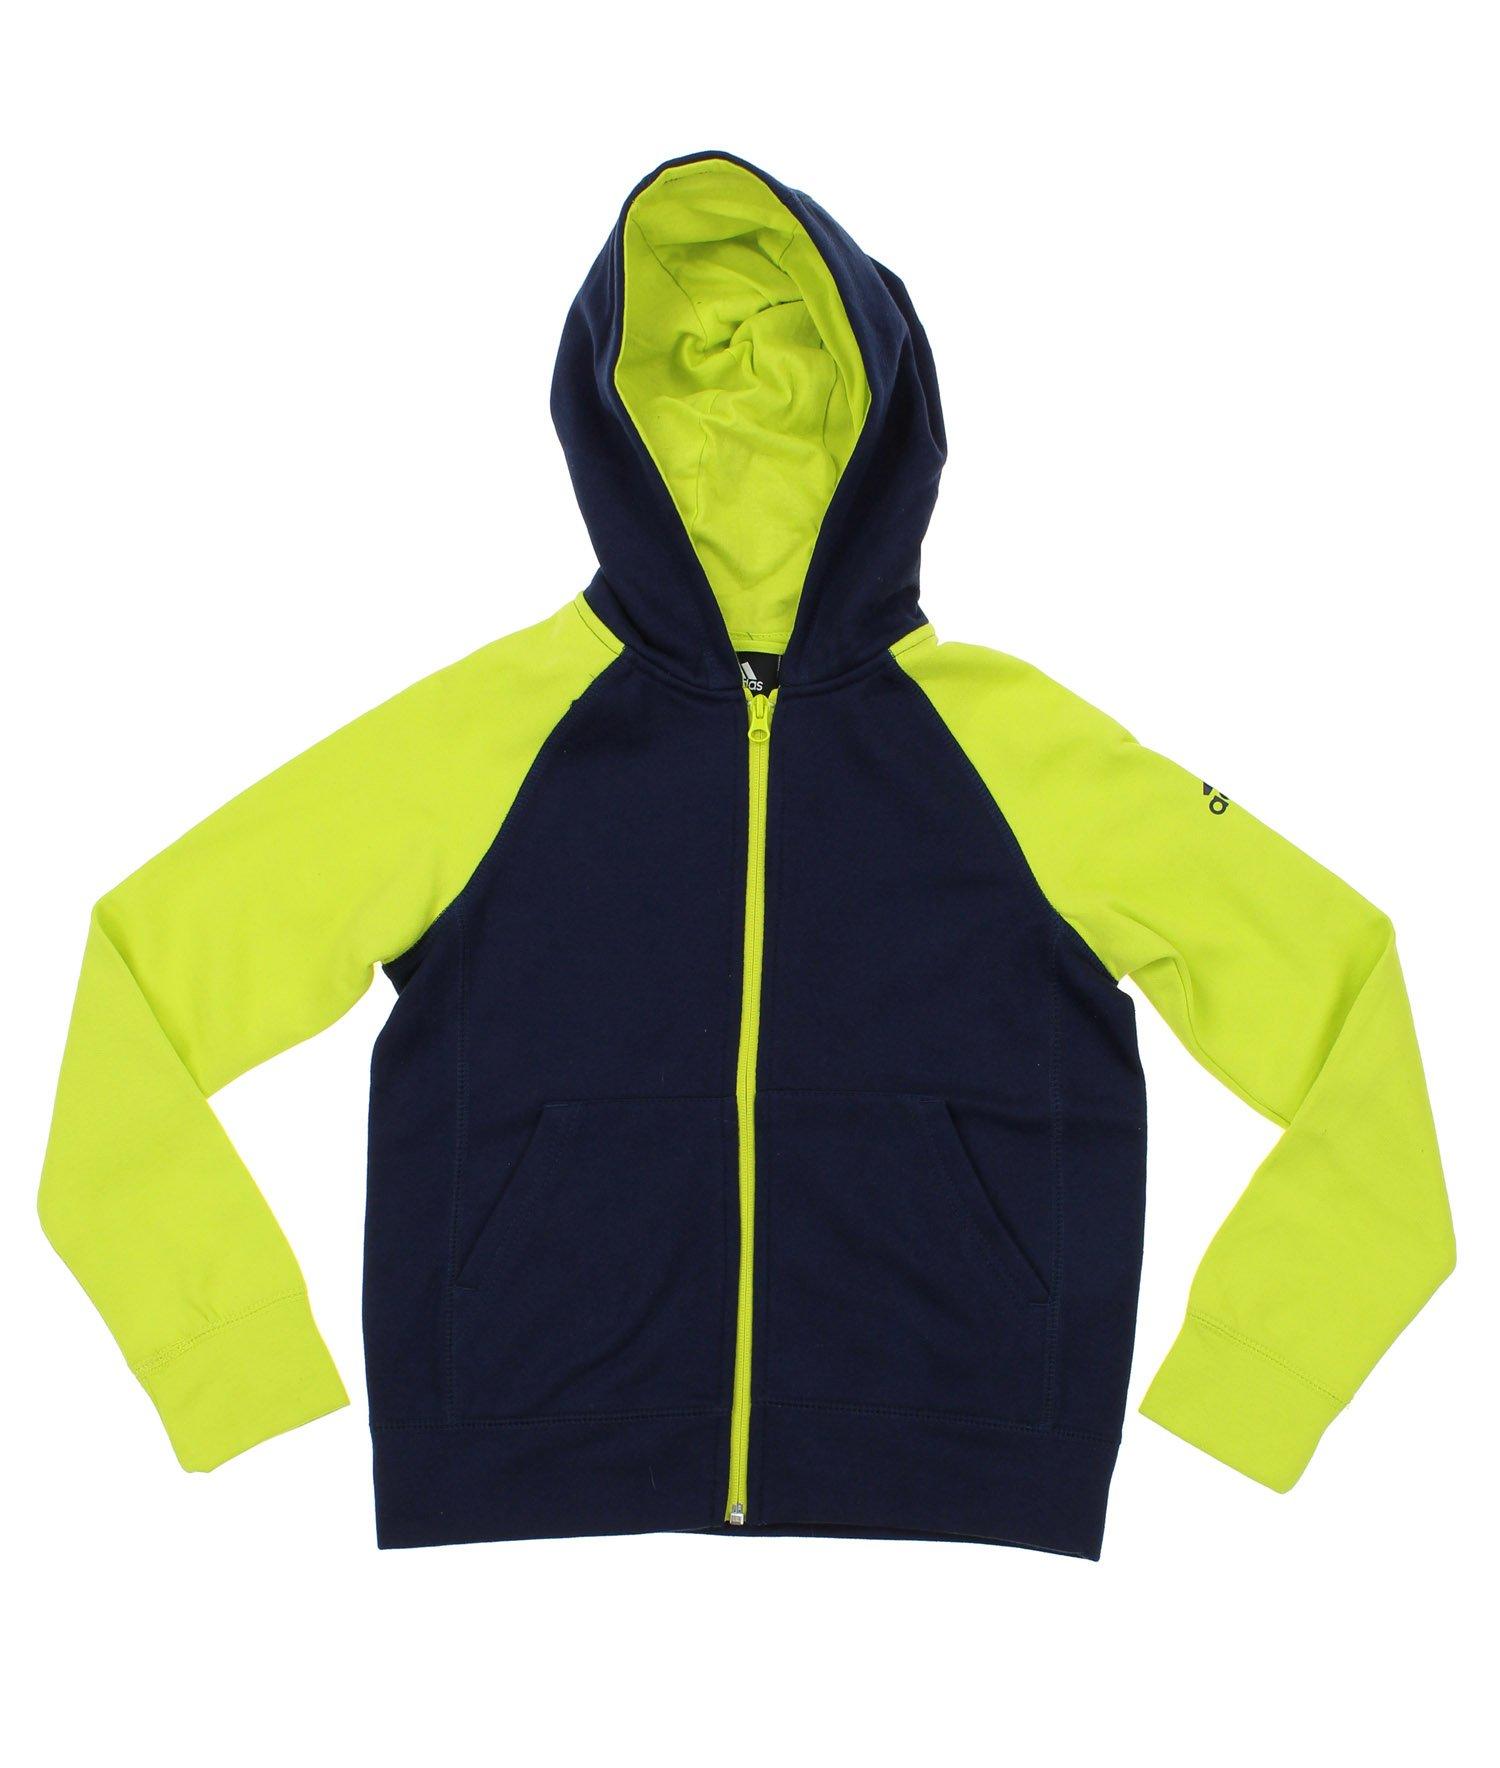 adidas Youth Boy's Full-Zip Contrast Sleeve Hoodie, Navy/Lime